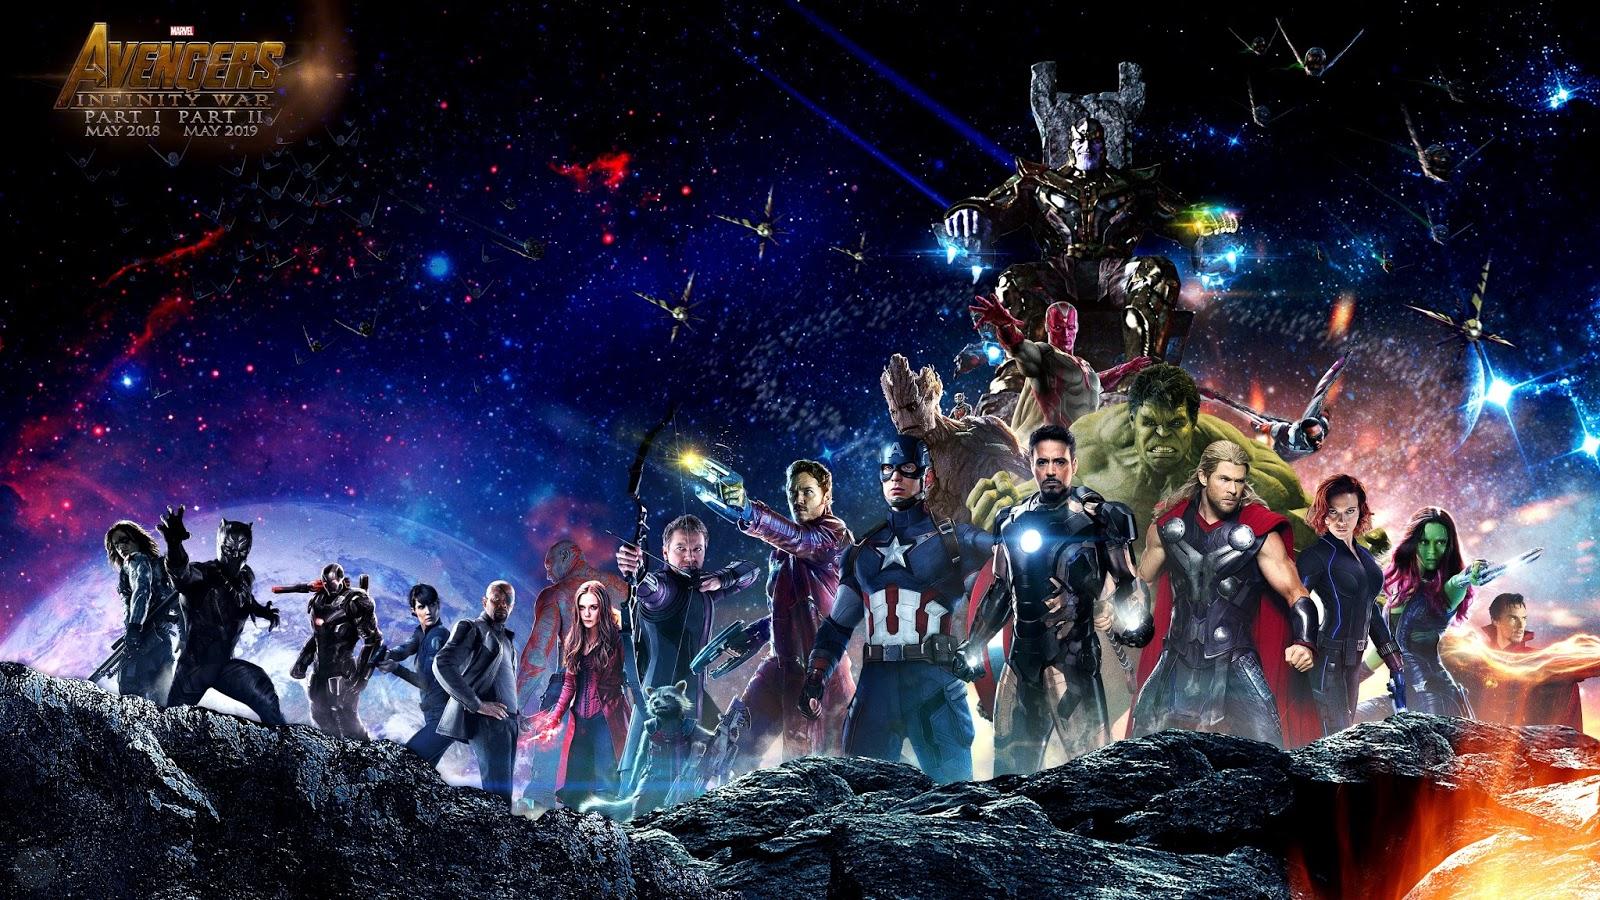 Avengers Infinity War Wallpapers - Infinity War Superheroes 4k